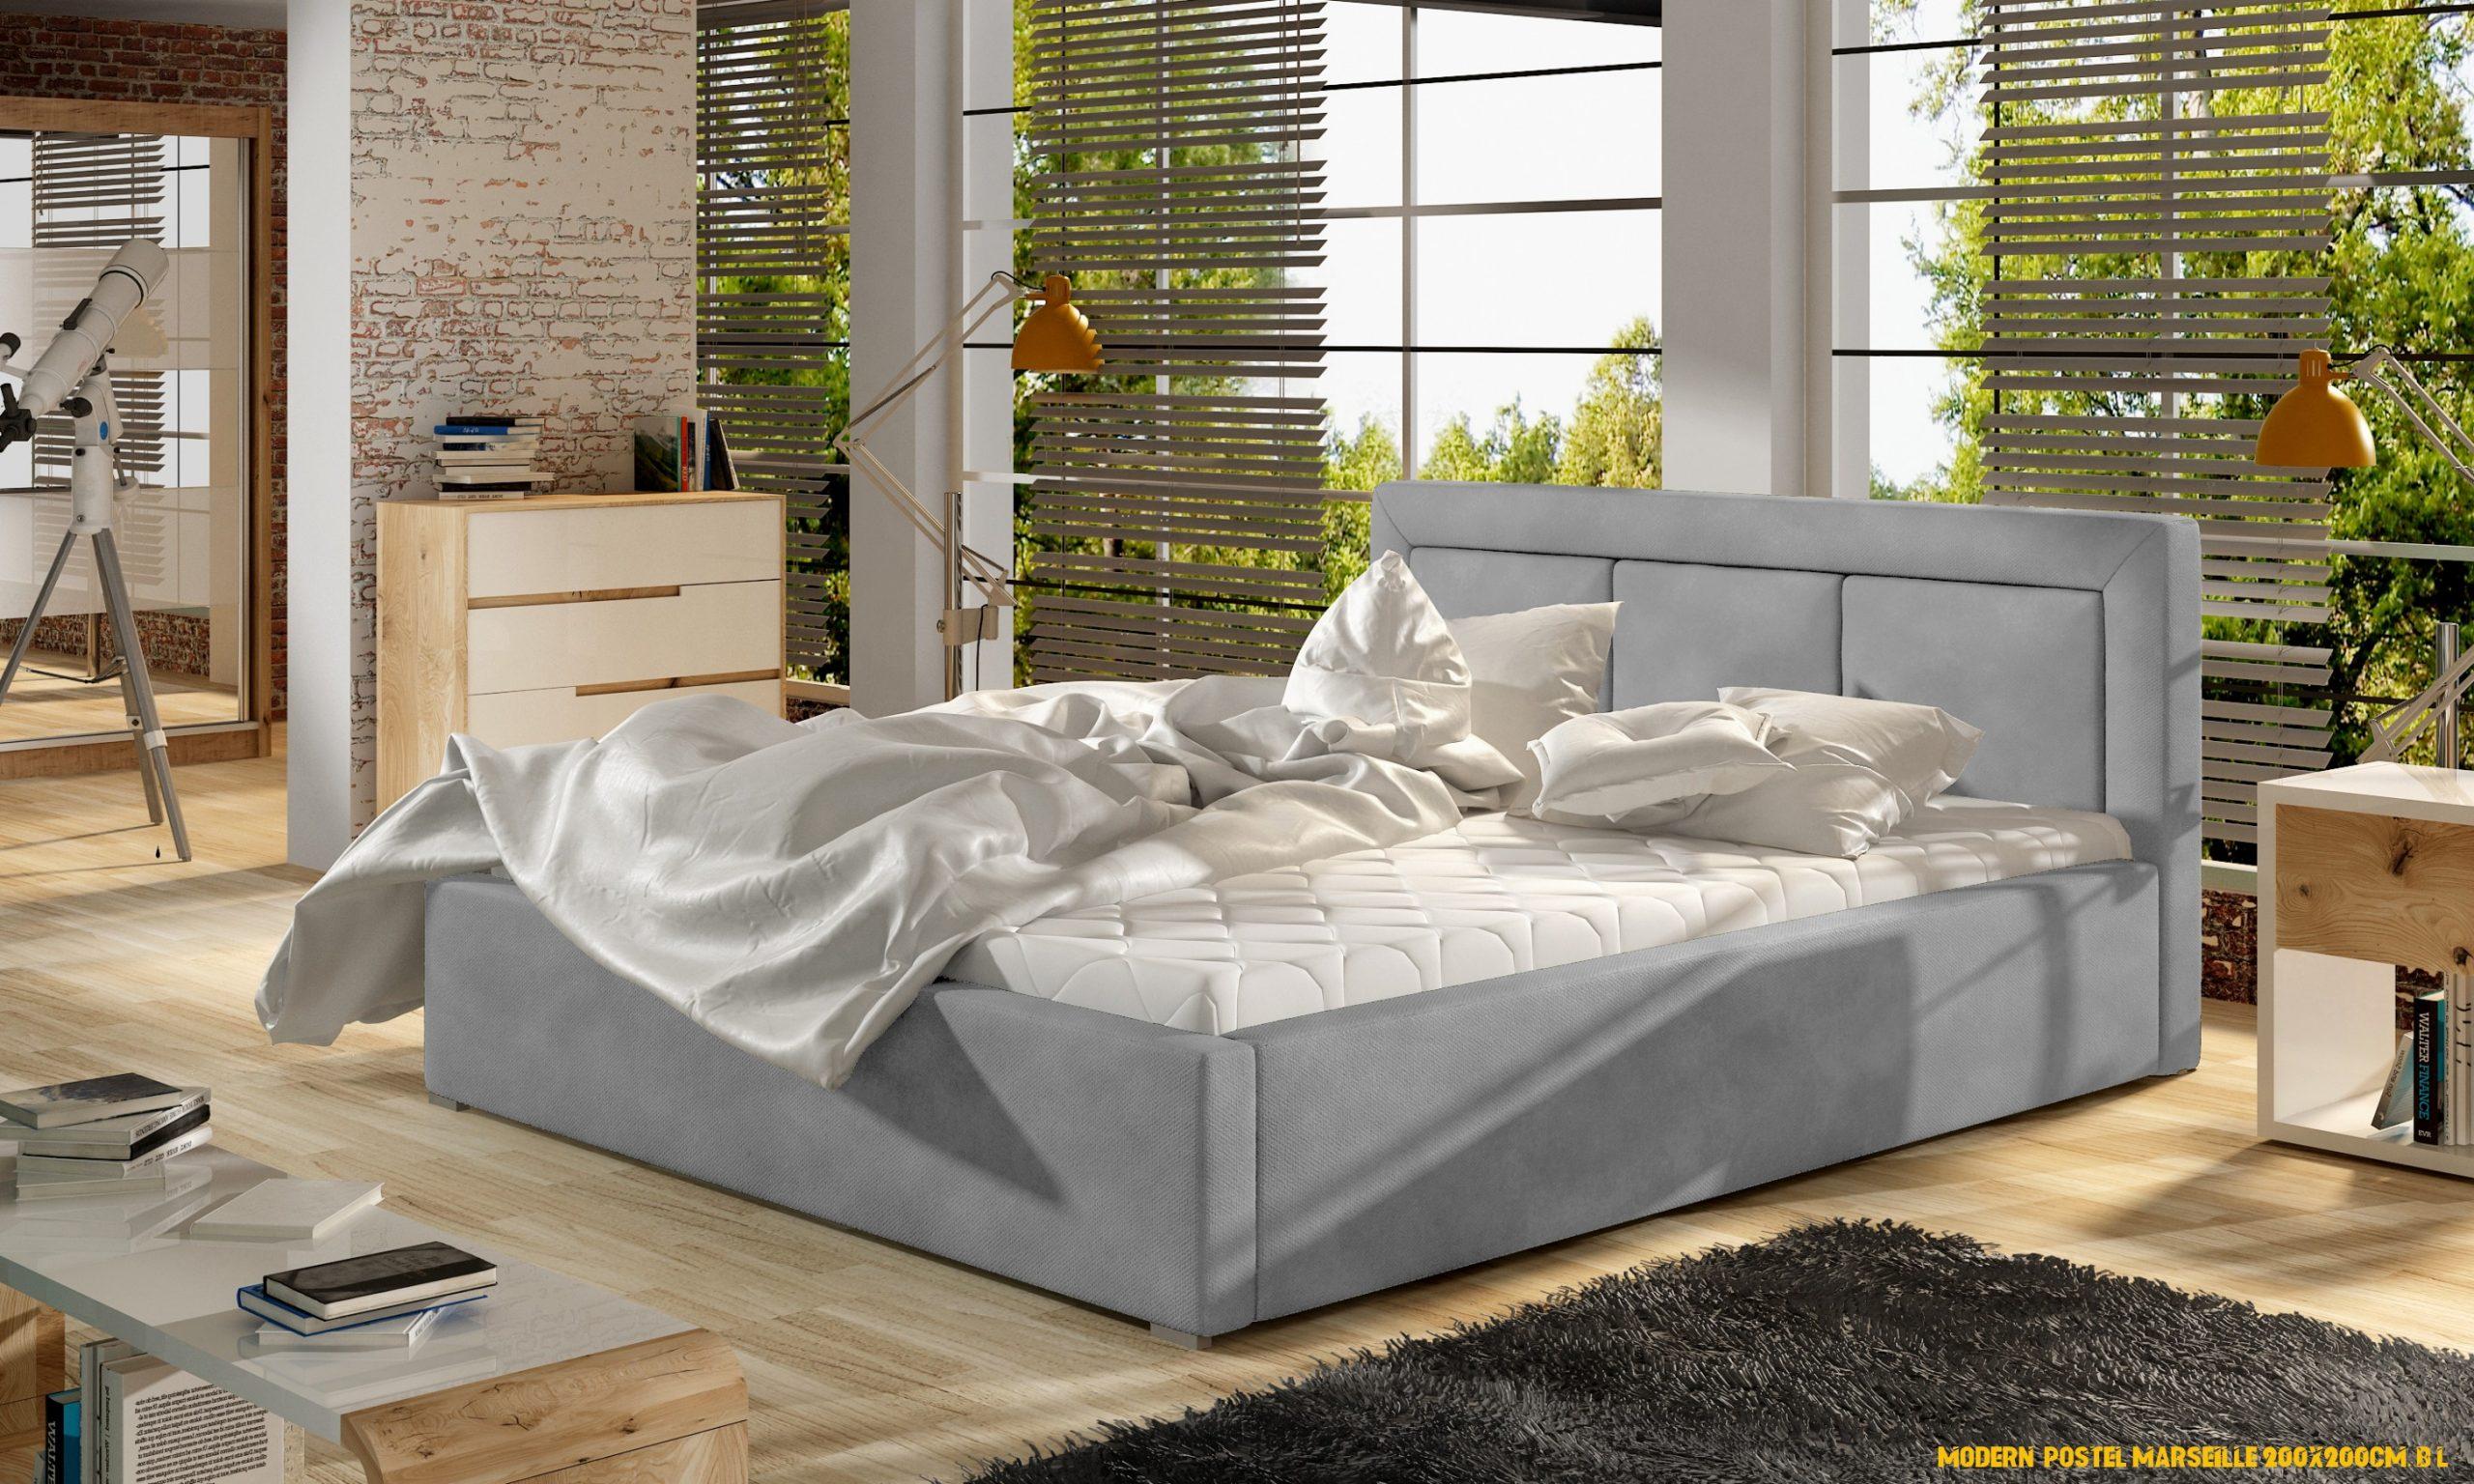 Moderní postel Marseille 4x4cm, bílá - www.nabytek-helcel.cz